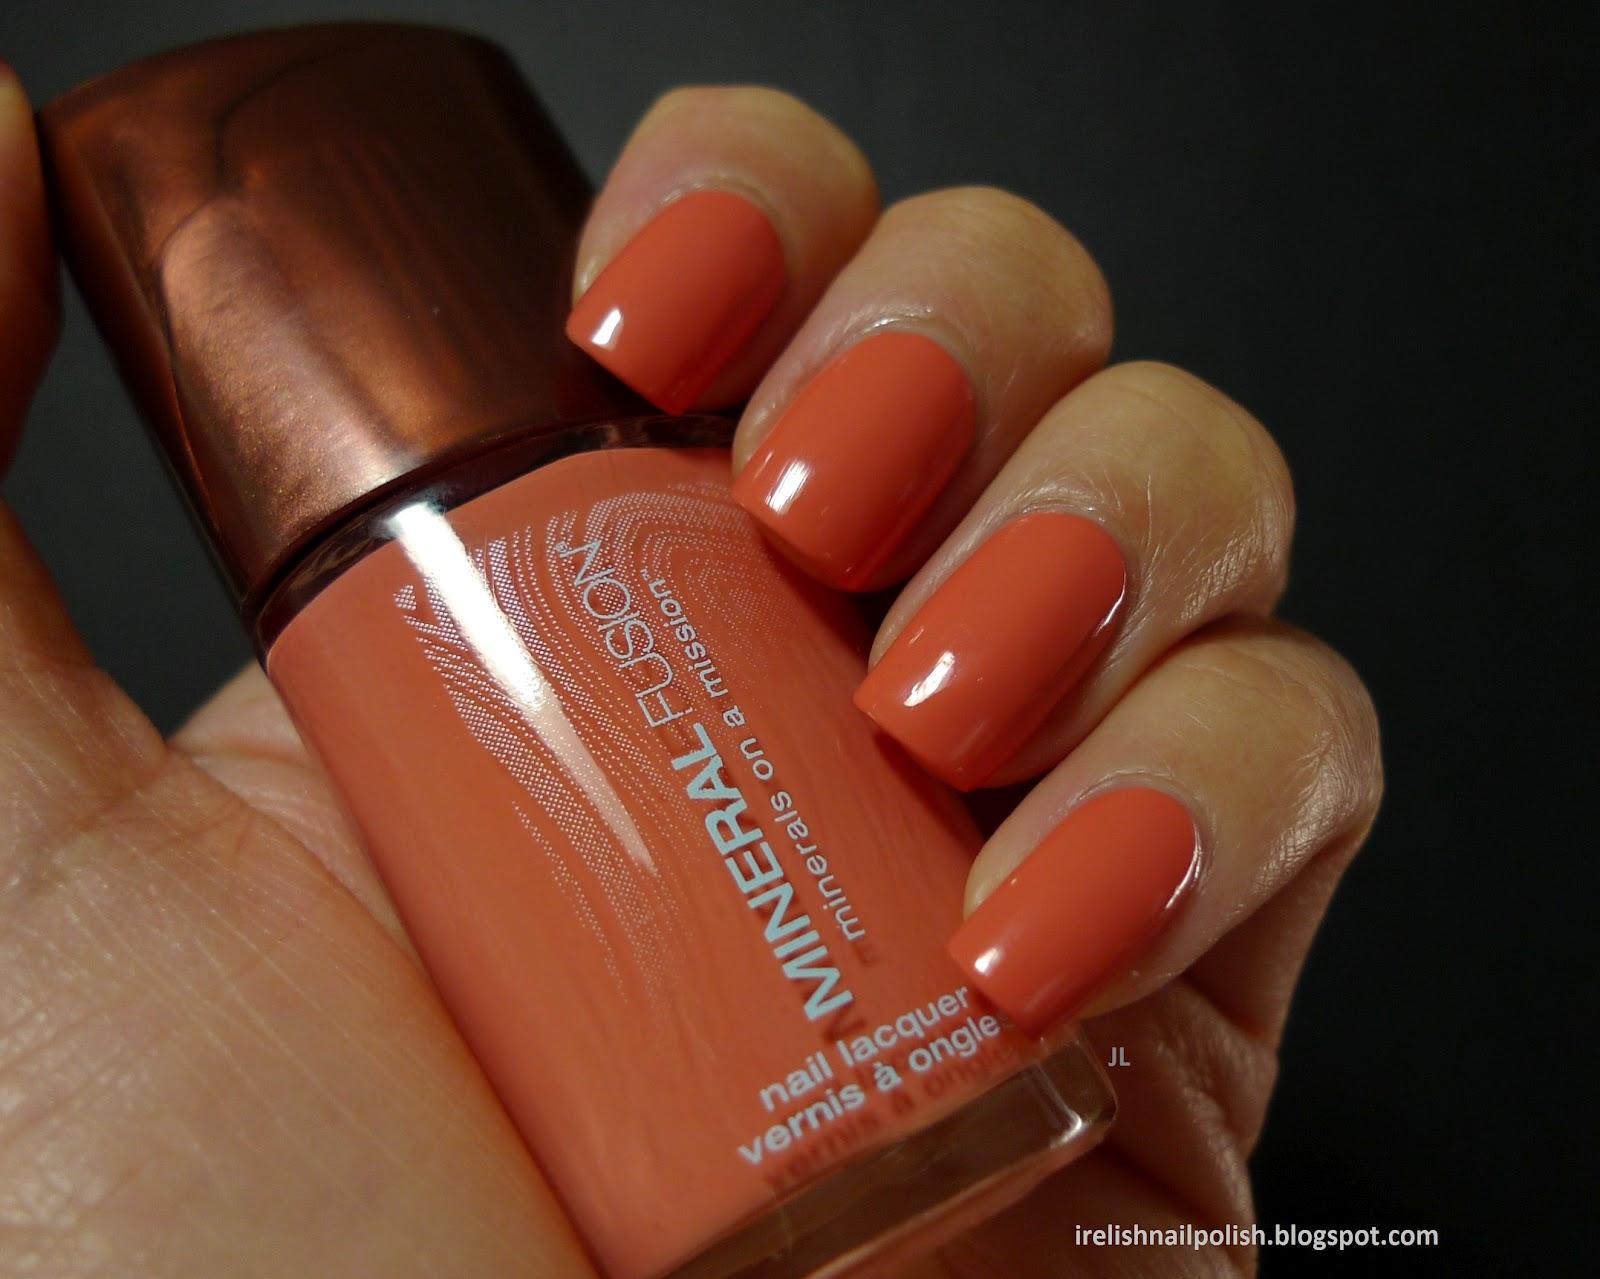 I Relish Nail Polish!: Mineral Fusion - Sunkissed